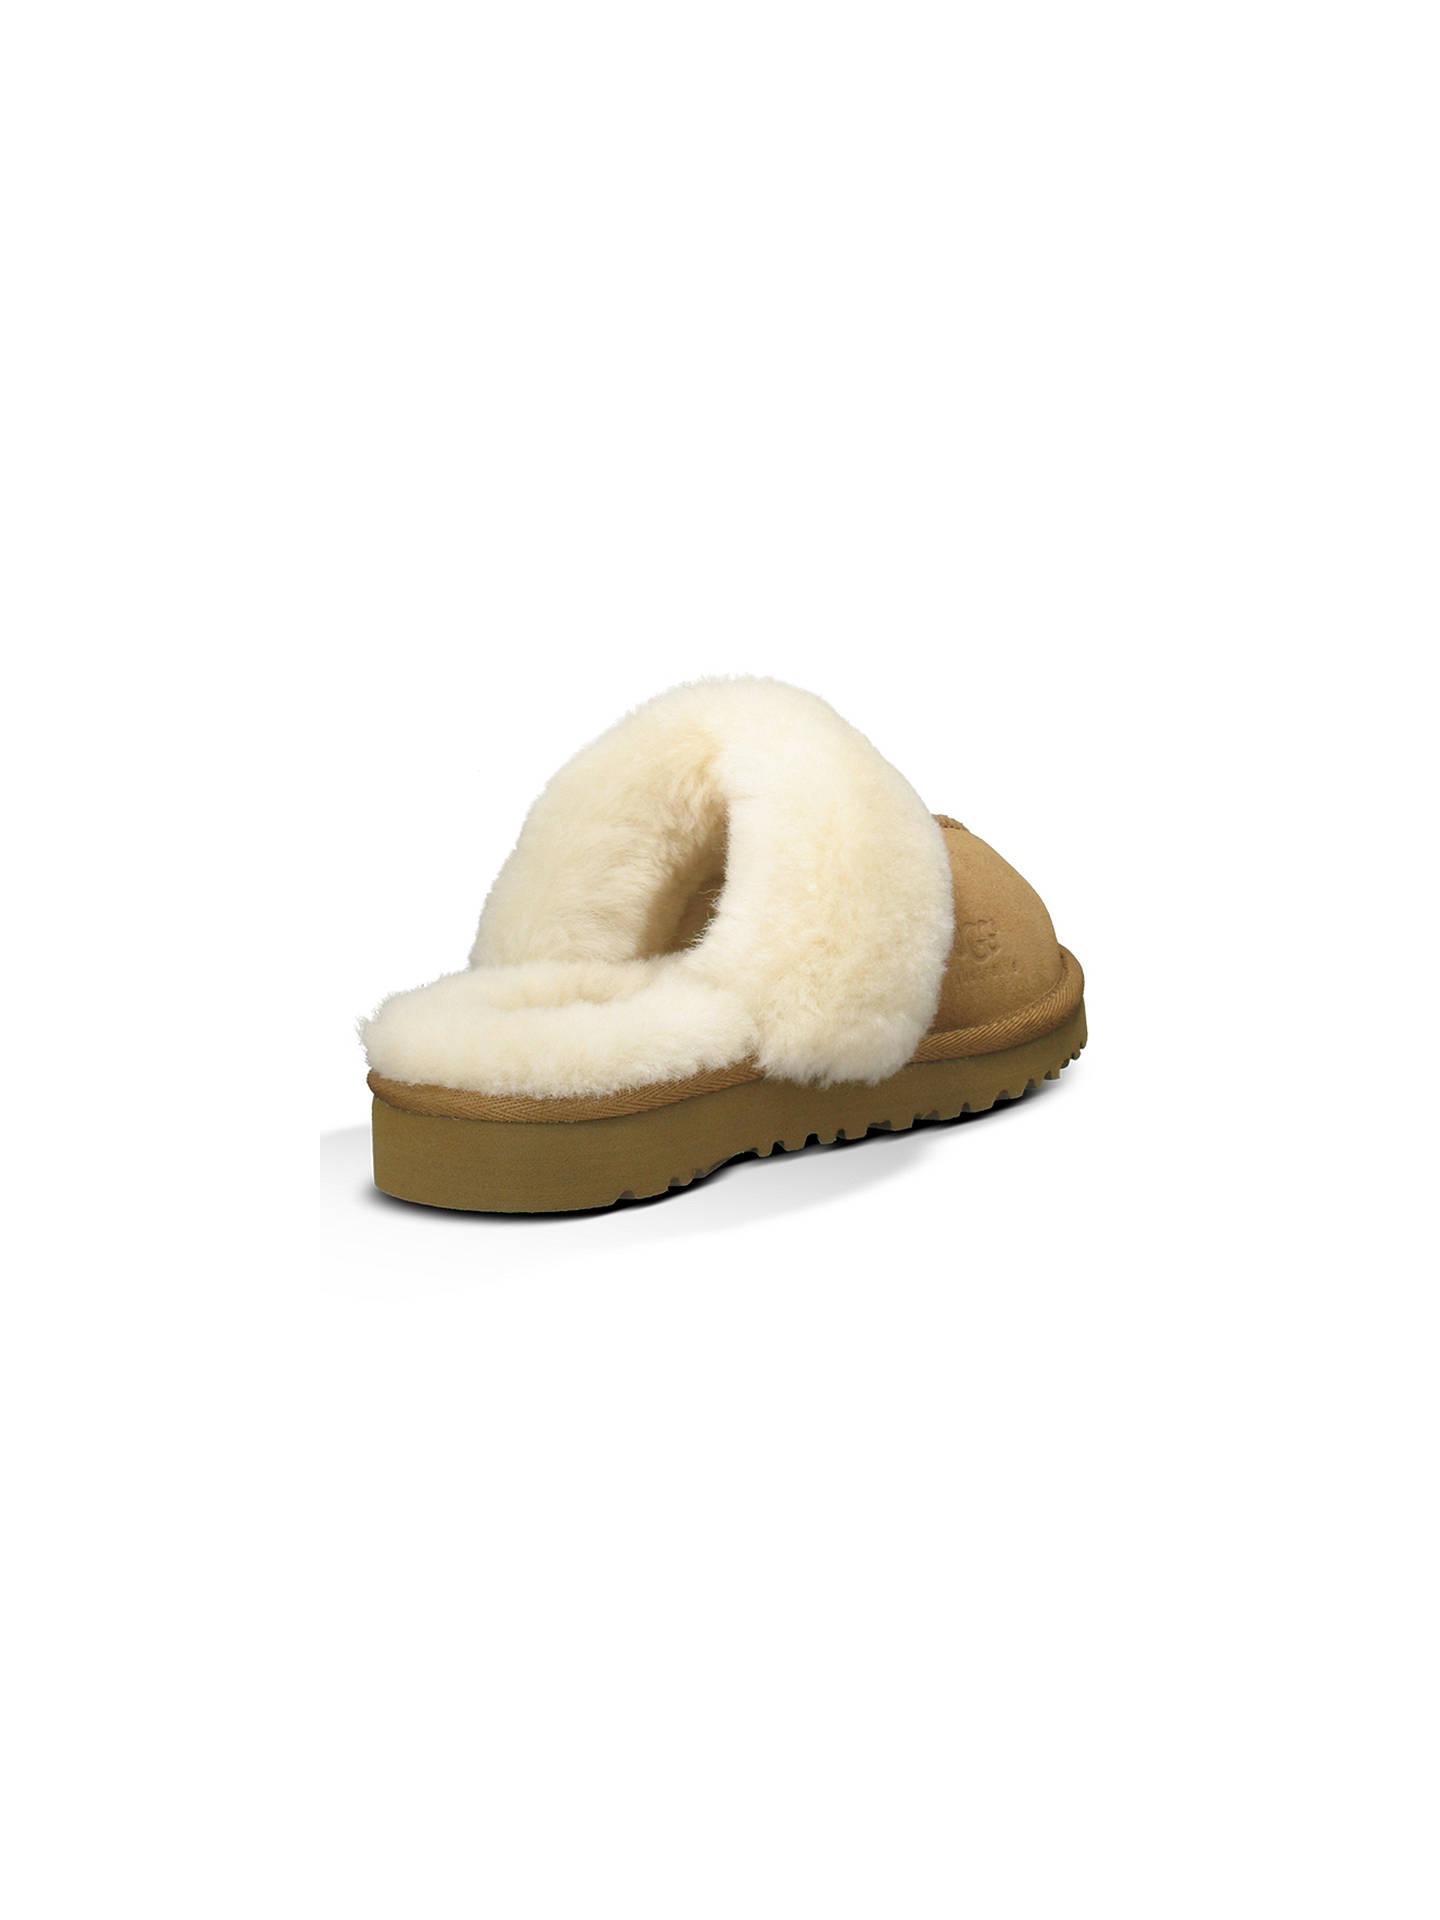 96dd98fb21f UGG Children's Cozy Mule Slippers, Chestnut at John Lewis & Partners